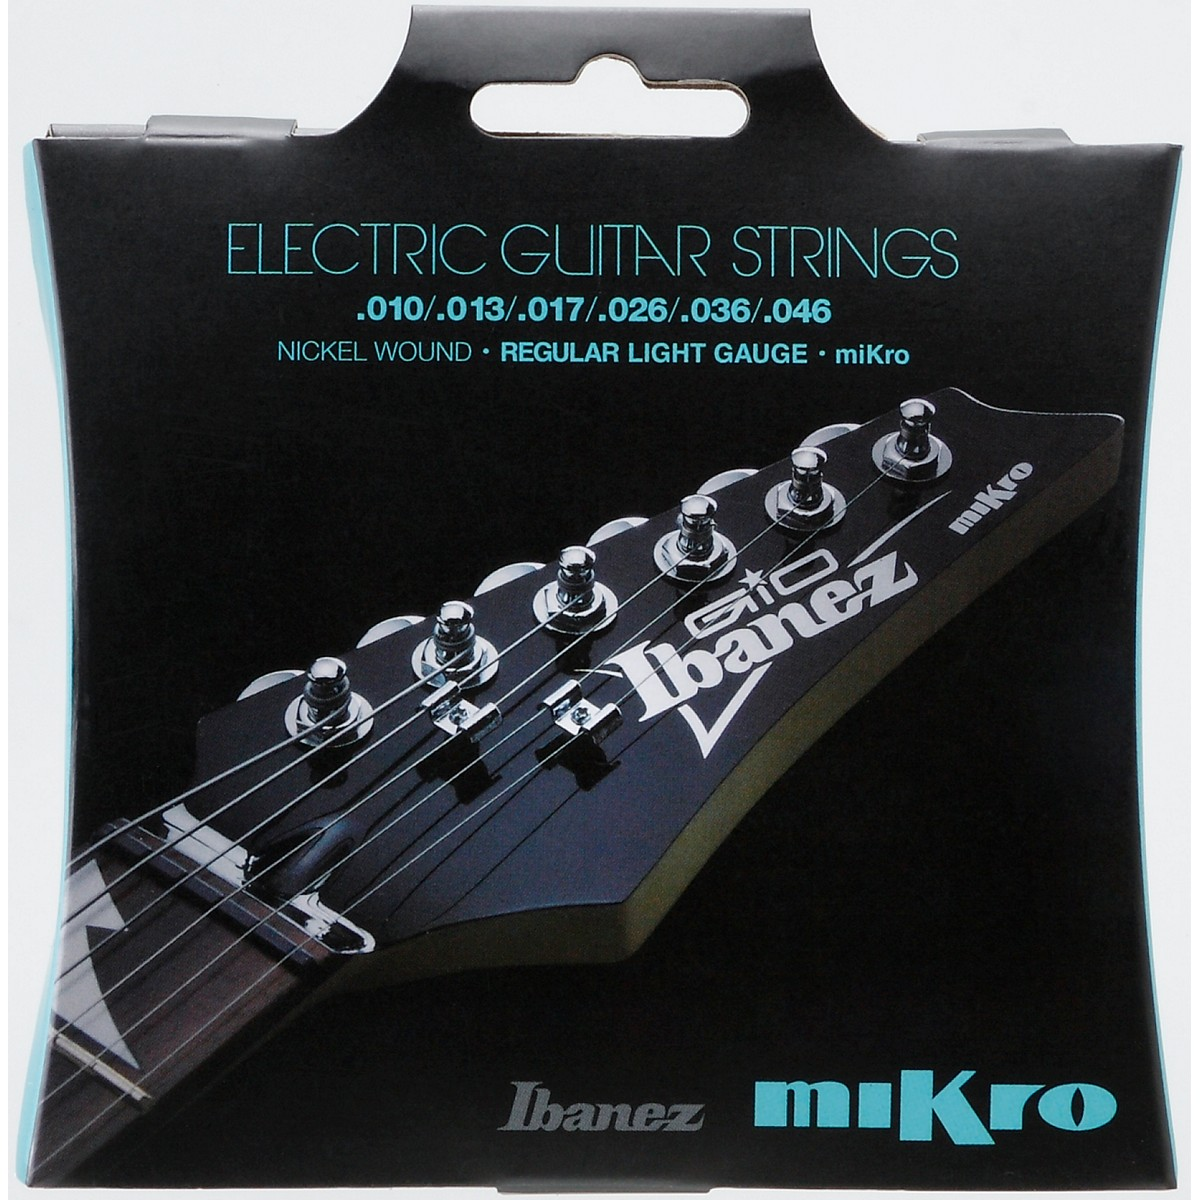 IBANEZ IEGS61MK - CORDE ELECTRIC GUITAR /MIKRO